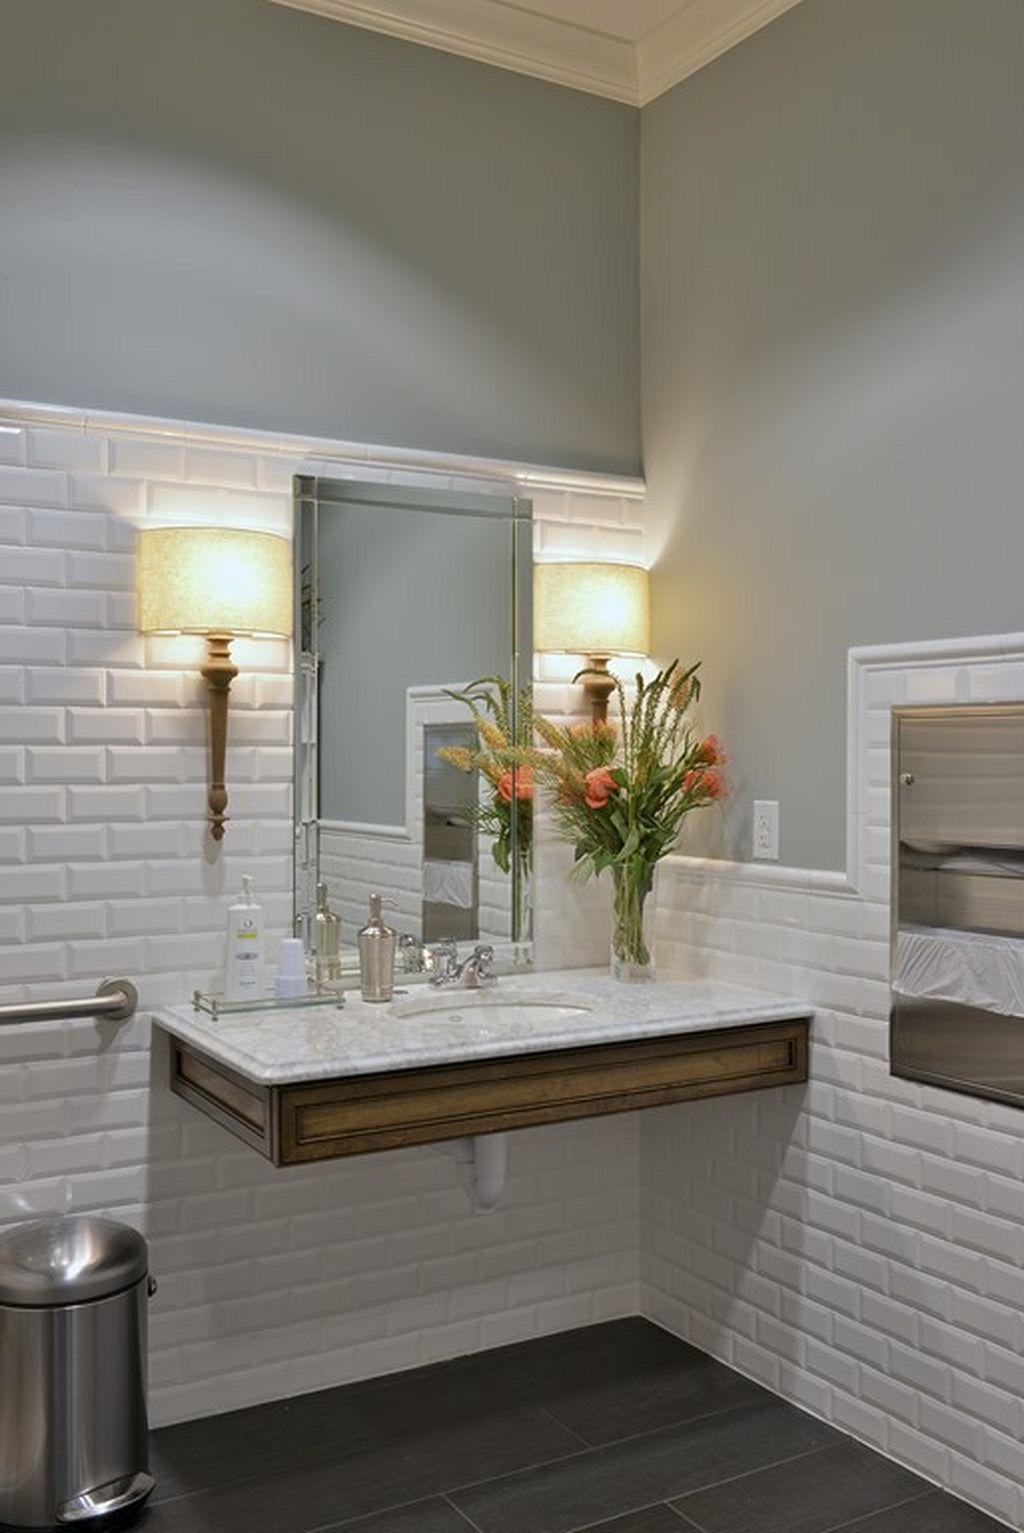 Awesome 60 Cozy Employee Break Room Ideas Https Kidmagz Com Id Office Bathroom Design Restroom Commercial Designs